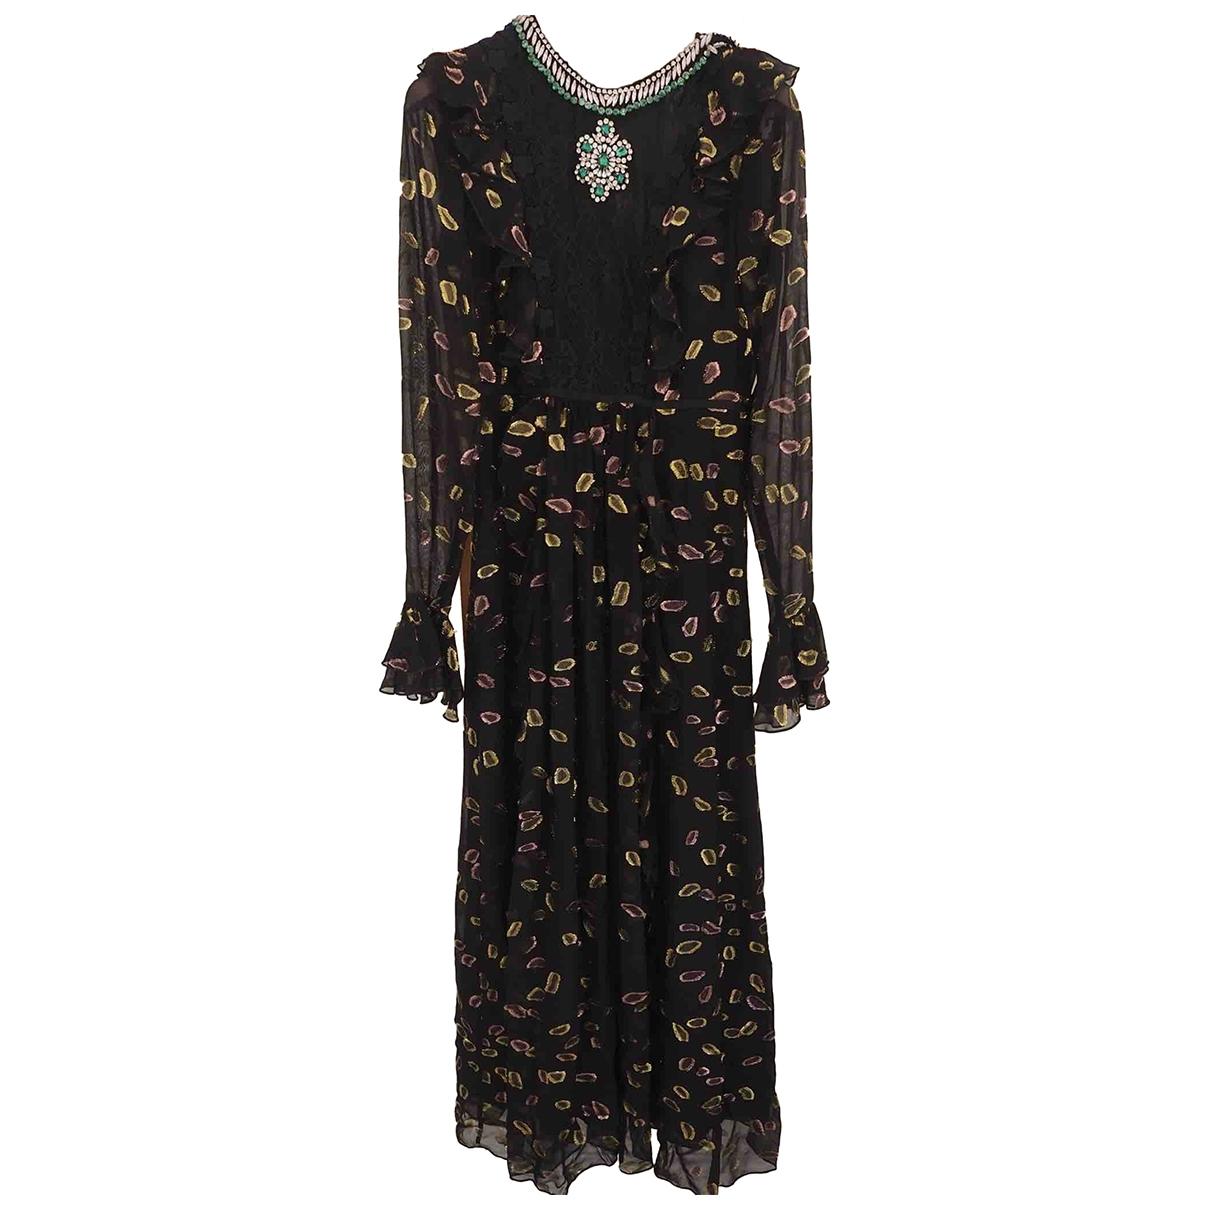 Giambattista Valli X H&m \N Black dress for Women 8 UK